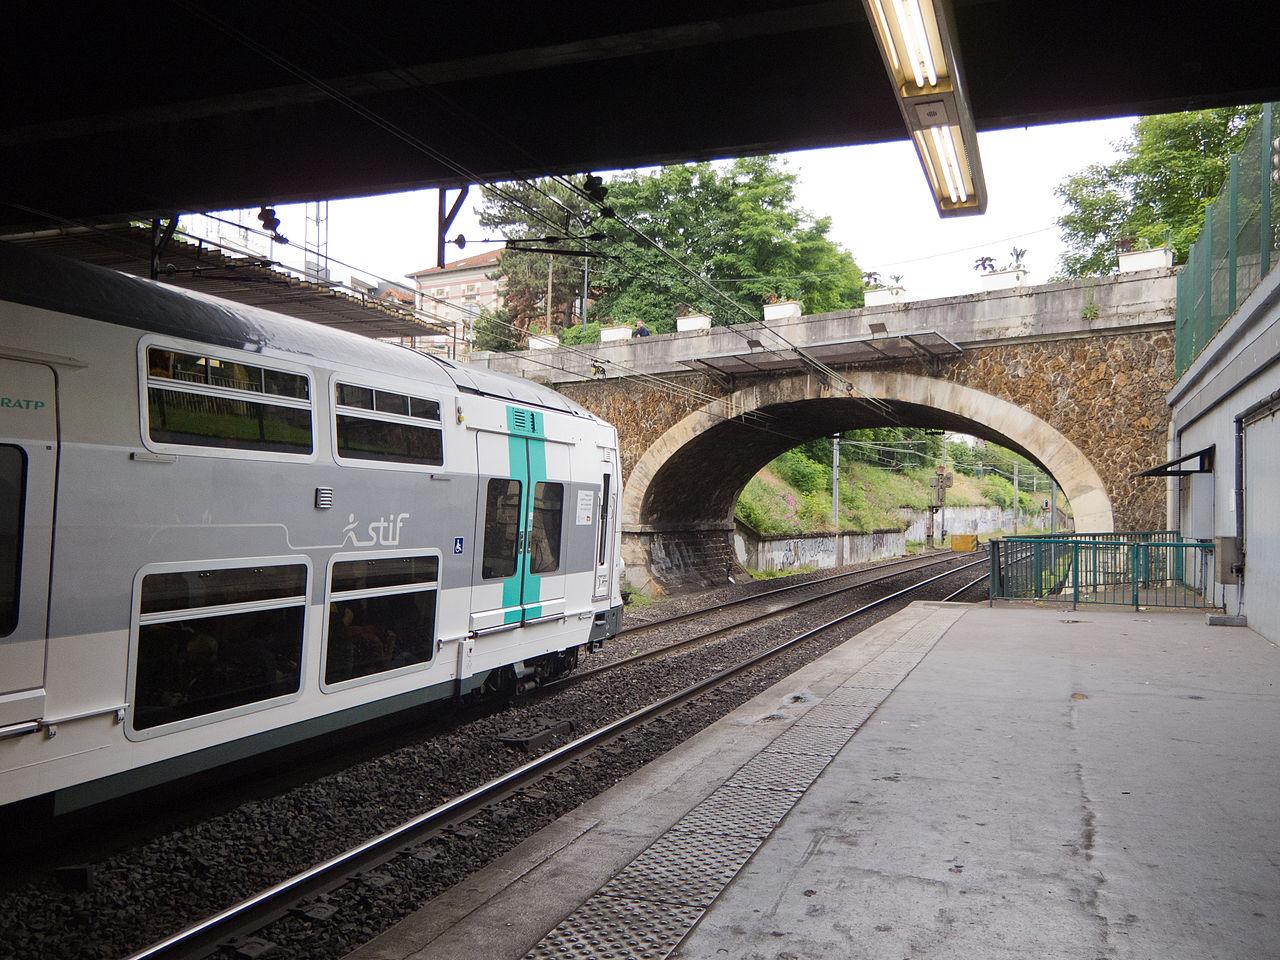 источник: Wikimedia commons